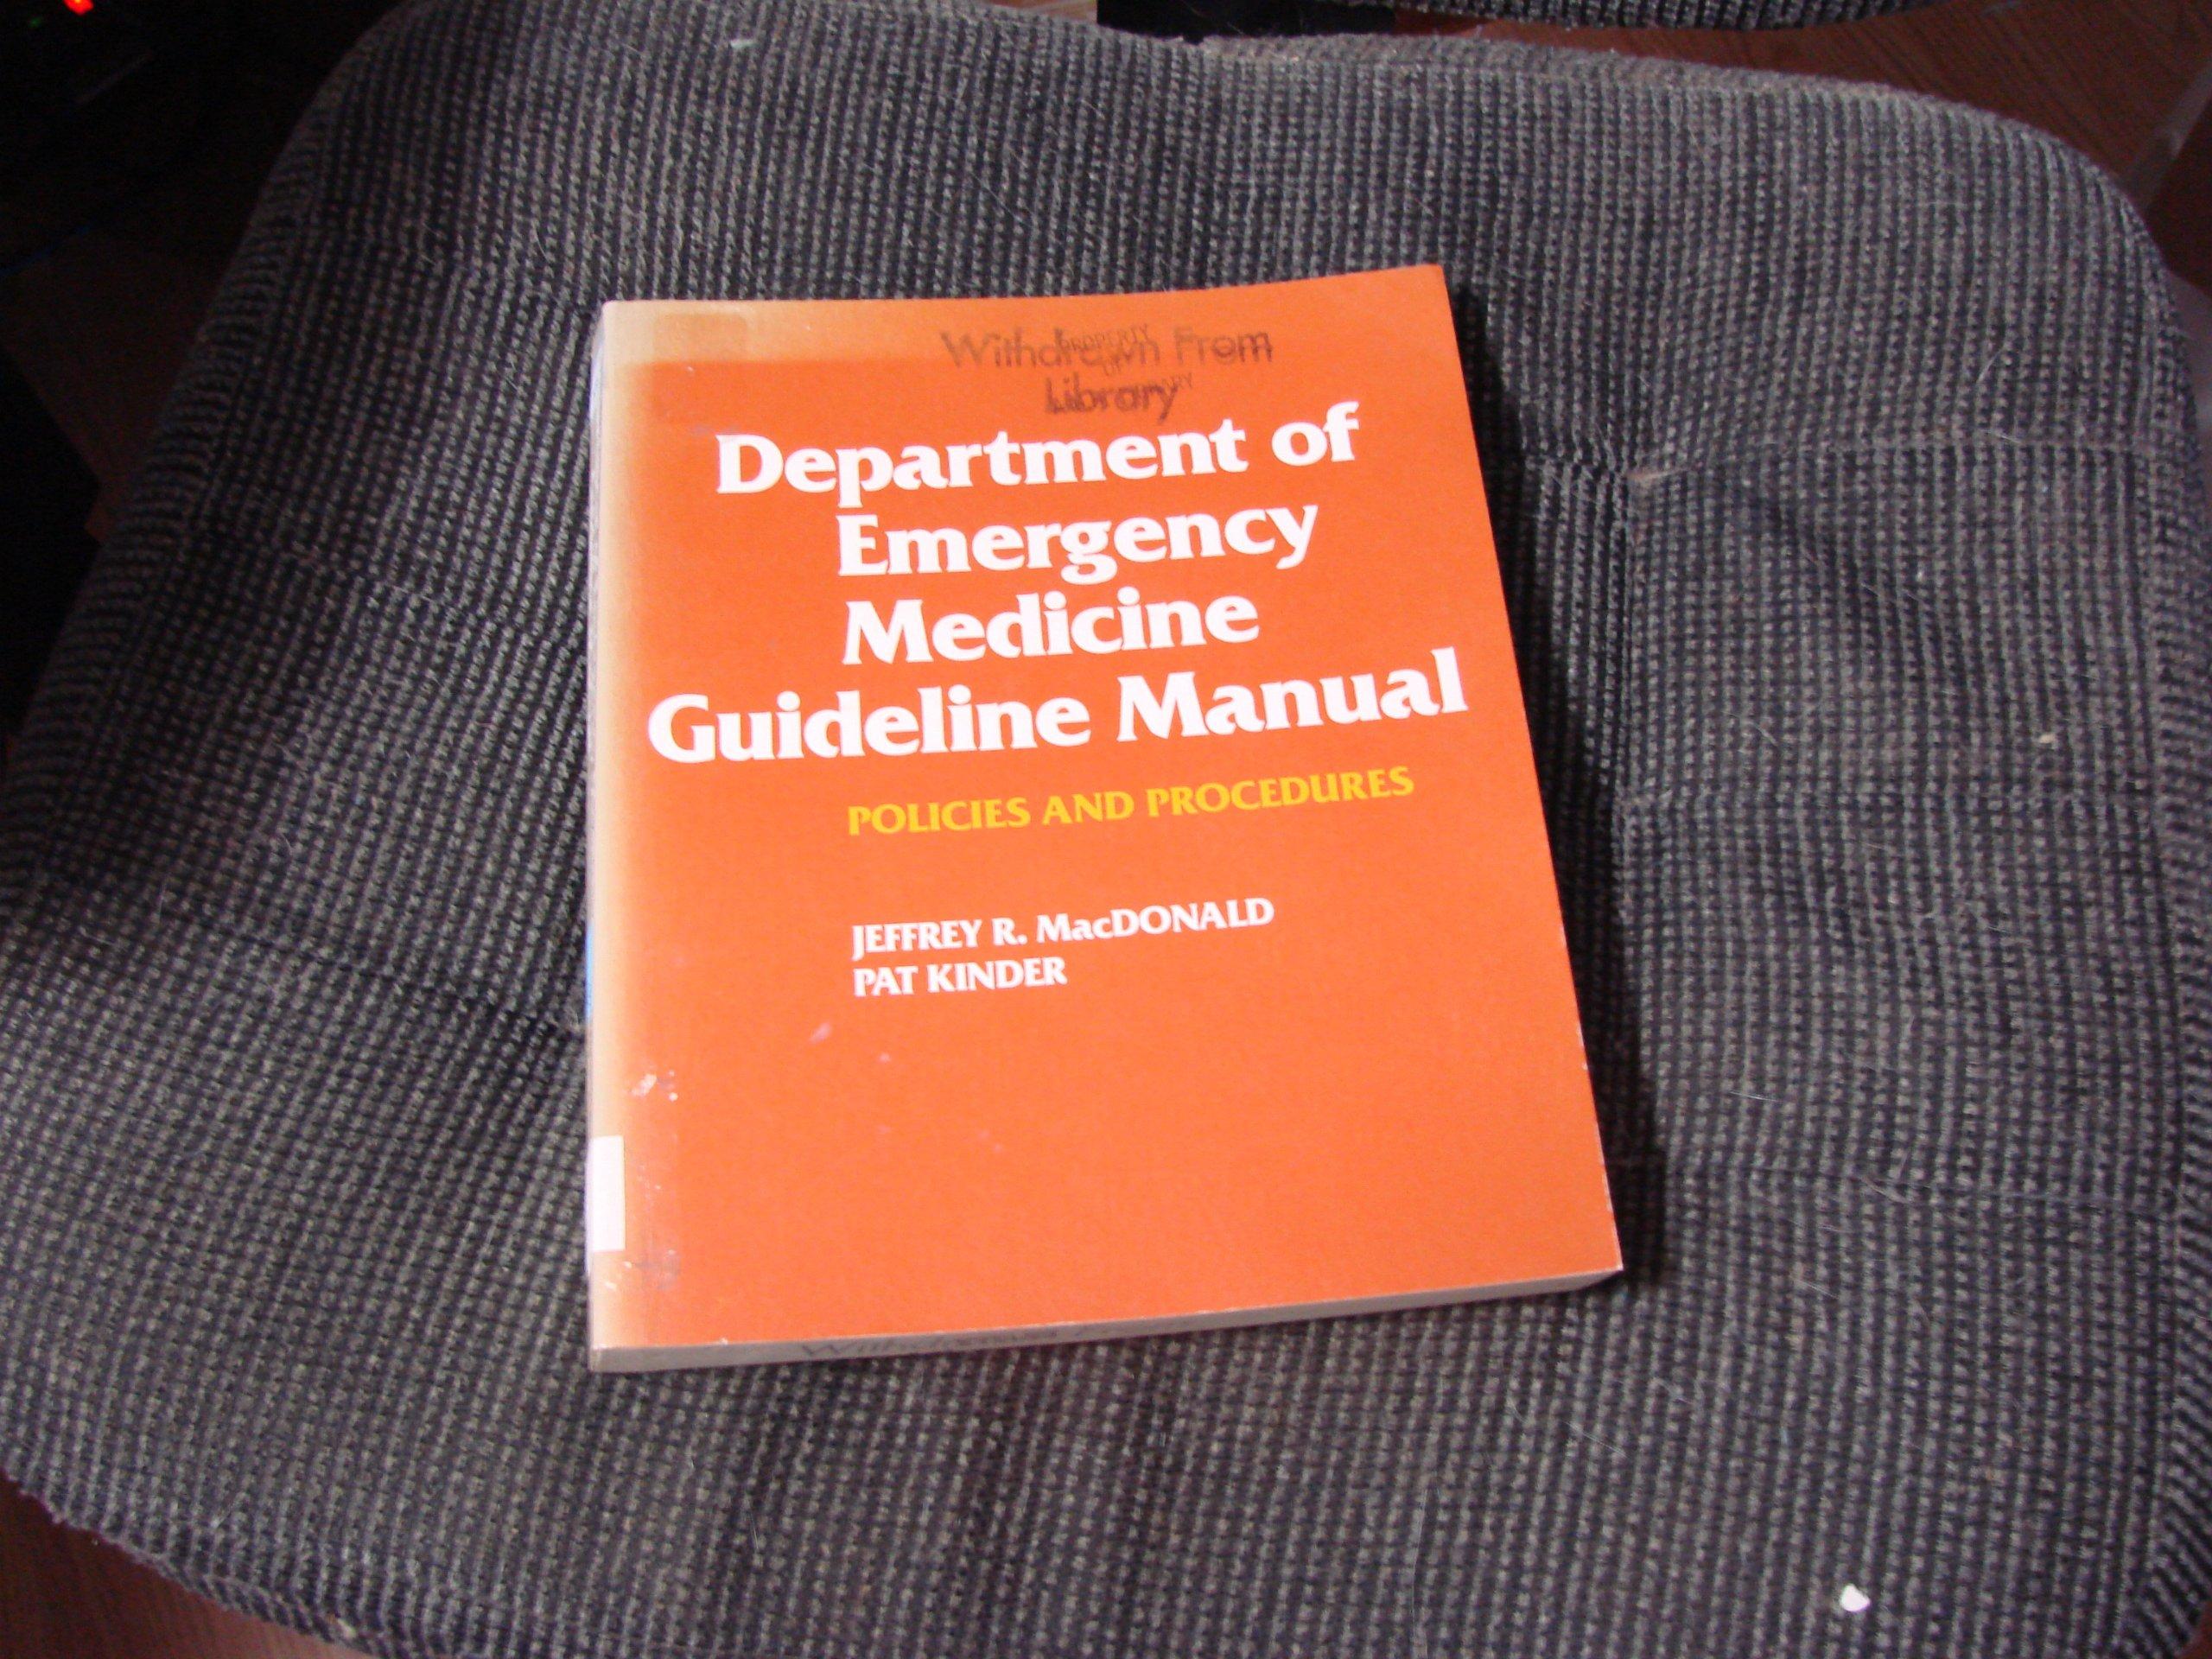 Department of emergency medicine guideline manual: Policies